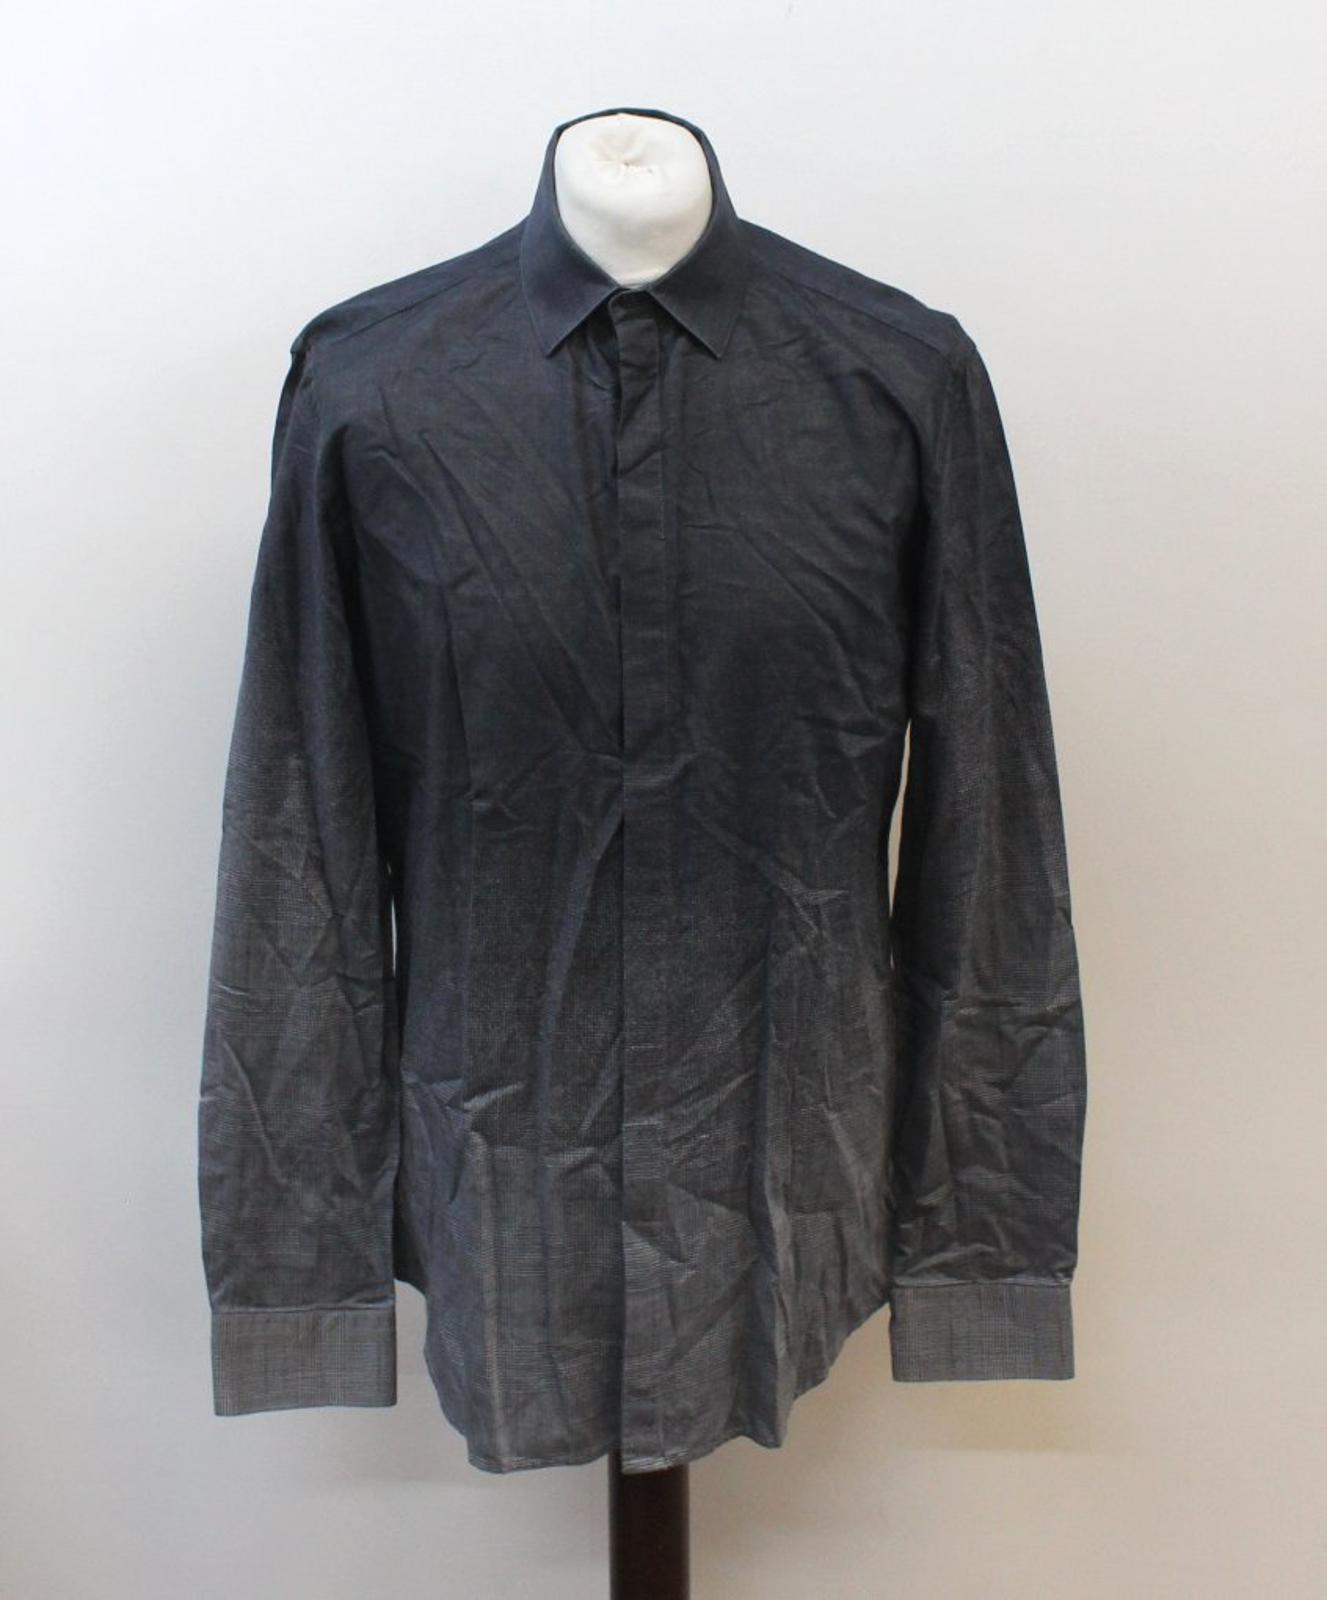 Neil-Barrett-Hombre-Luz-Gris-Oscuro-Algodon-Slim-Fit-Camisa-Cuello-Ombre-16-5-034-42cm miniatura 2